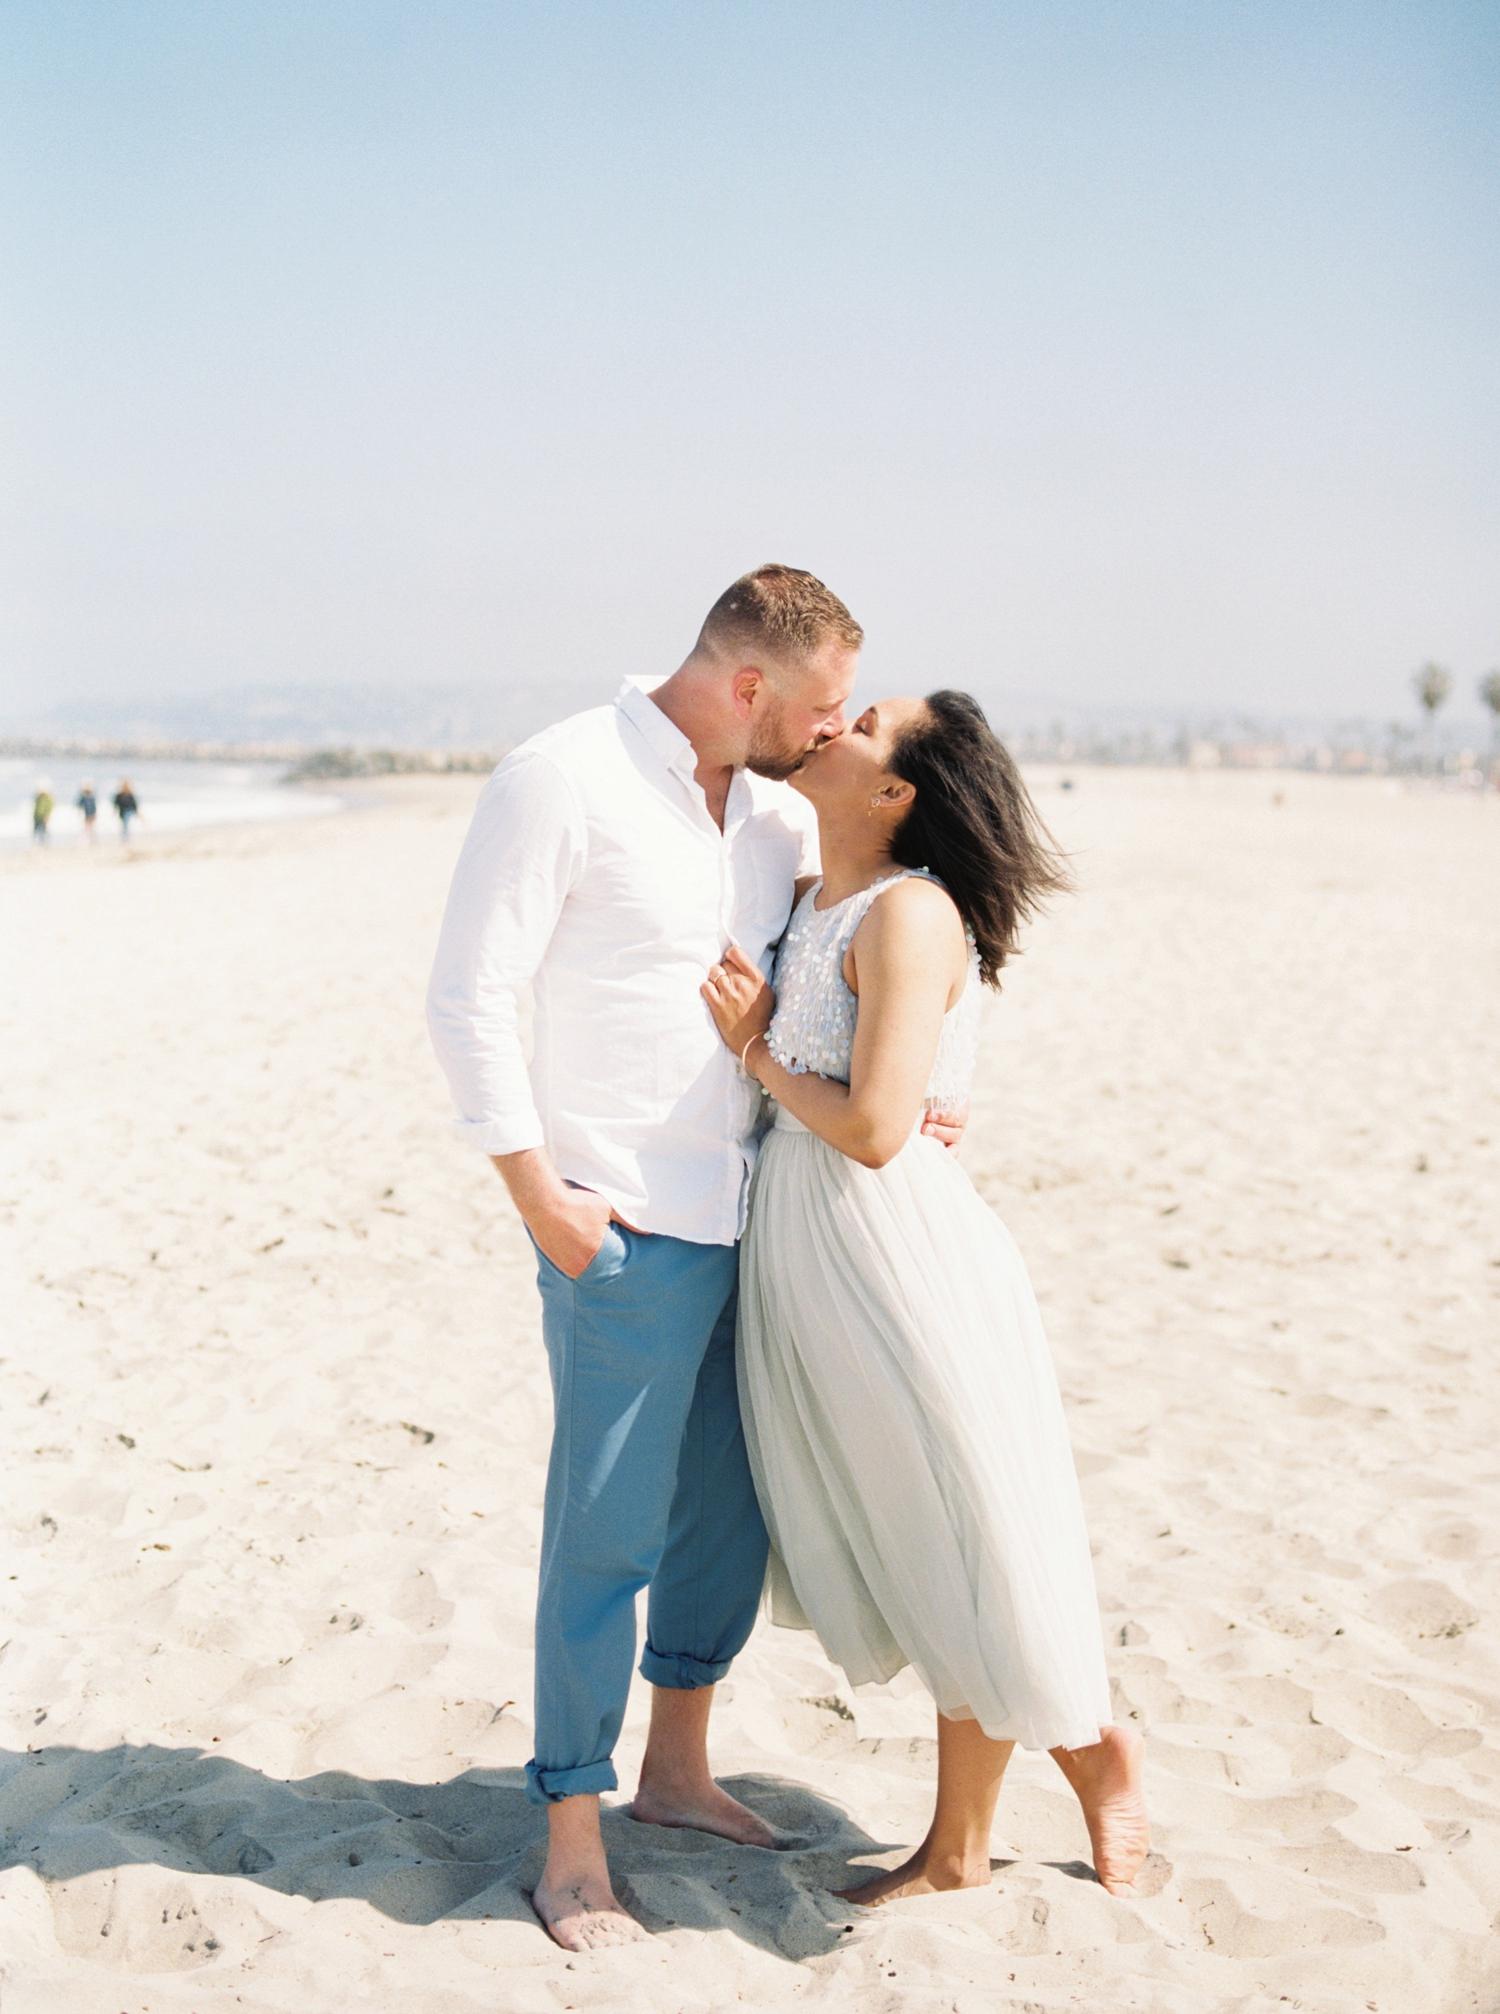 San-Diego-California-Beautiful-Film-Engagement-Wedding-Photographer-Balboa-Park-Sunset-Cliffs-Wedding-Photos_5176.jpg